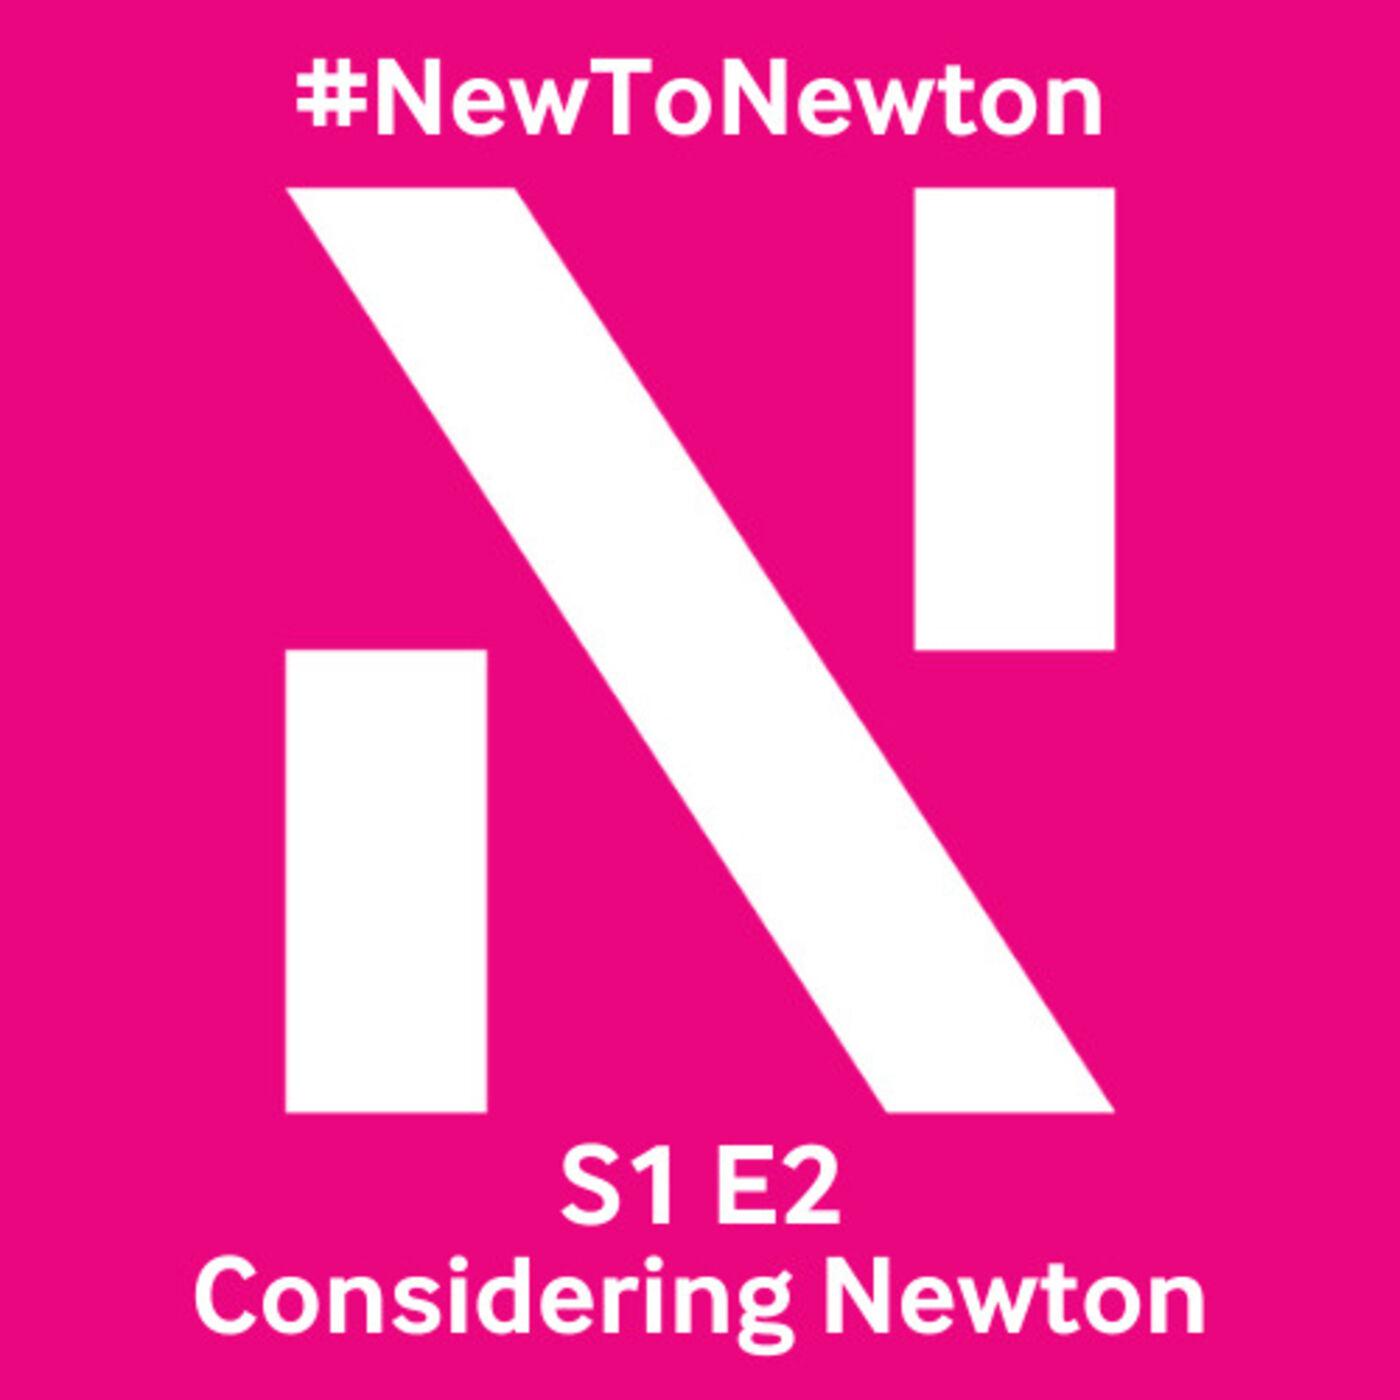 Considering Newton